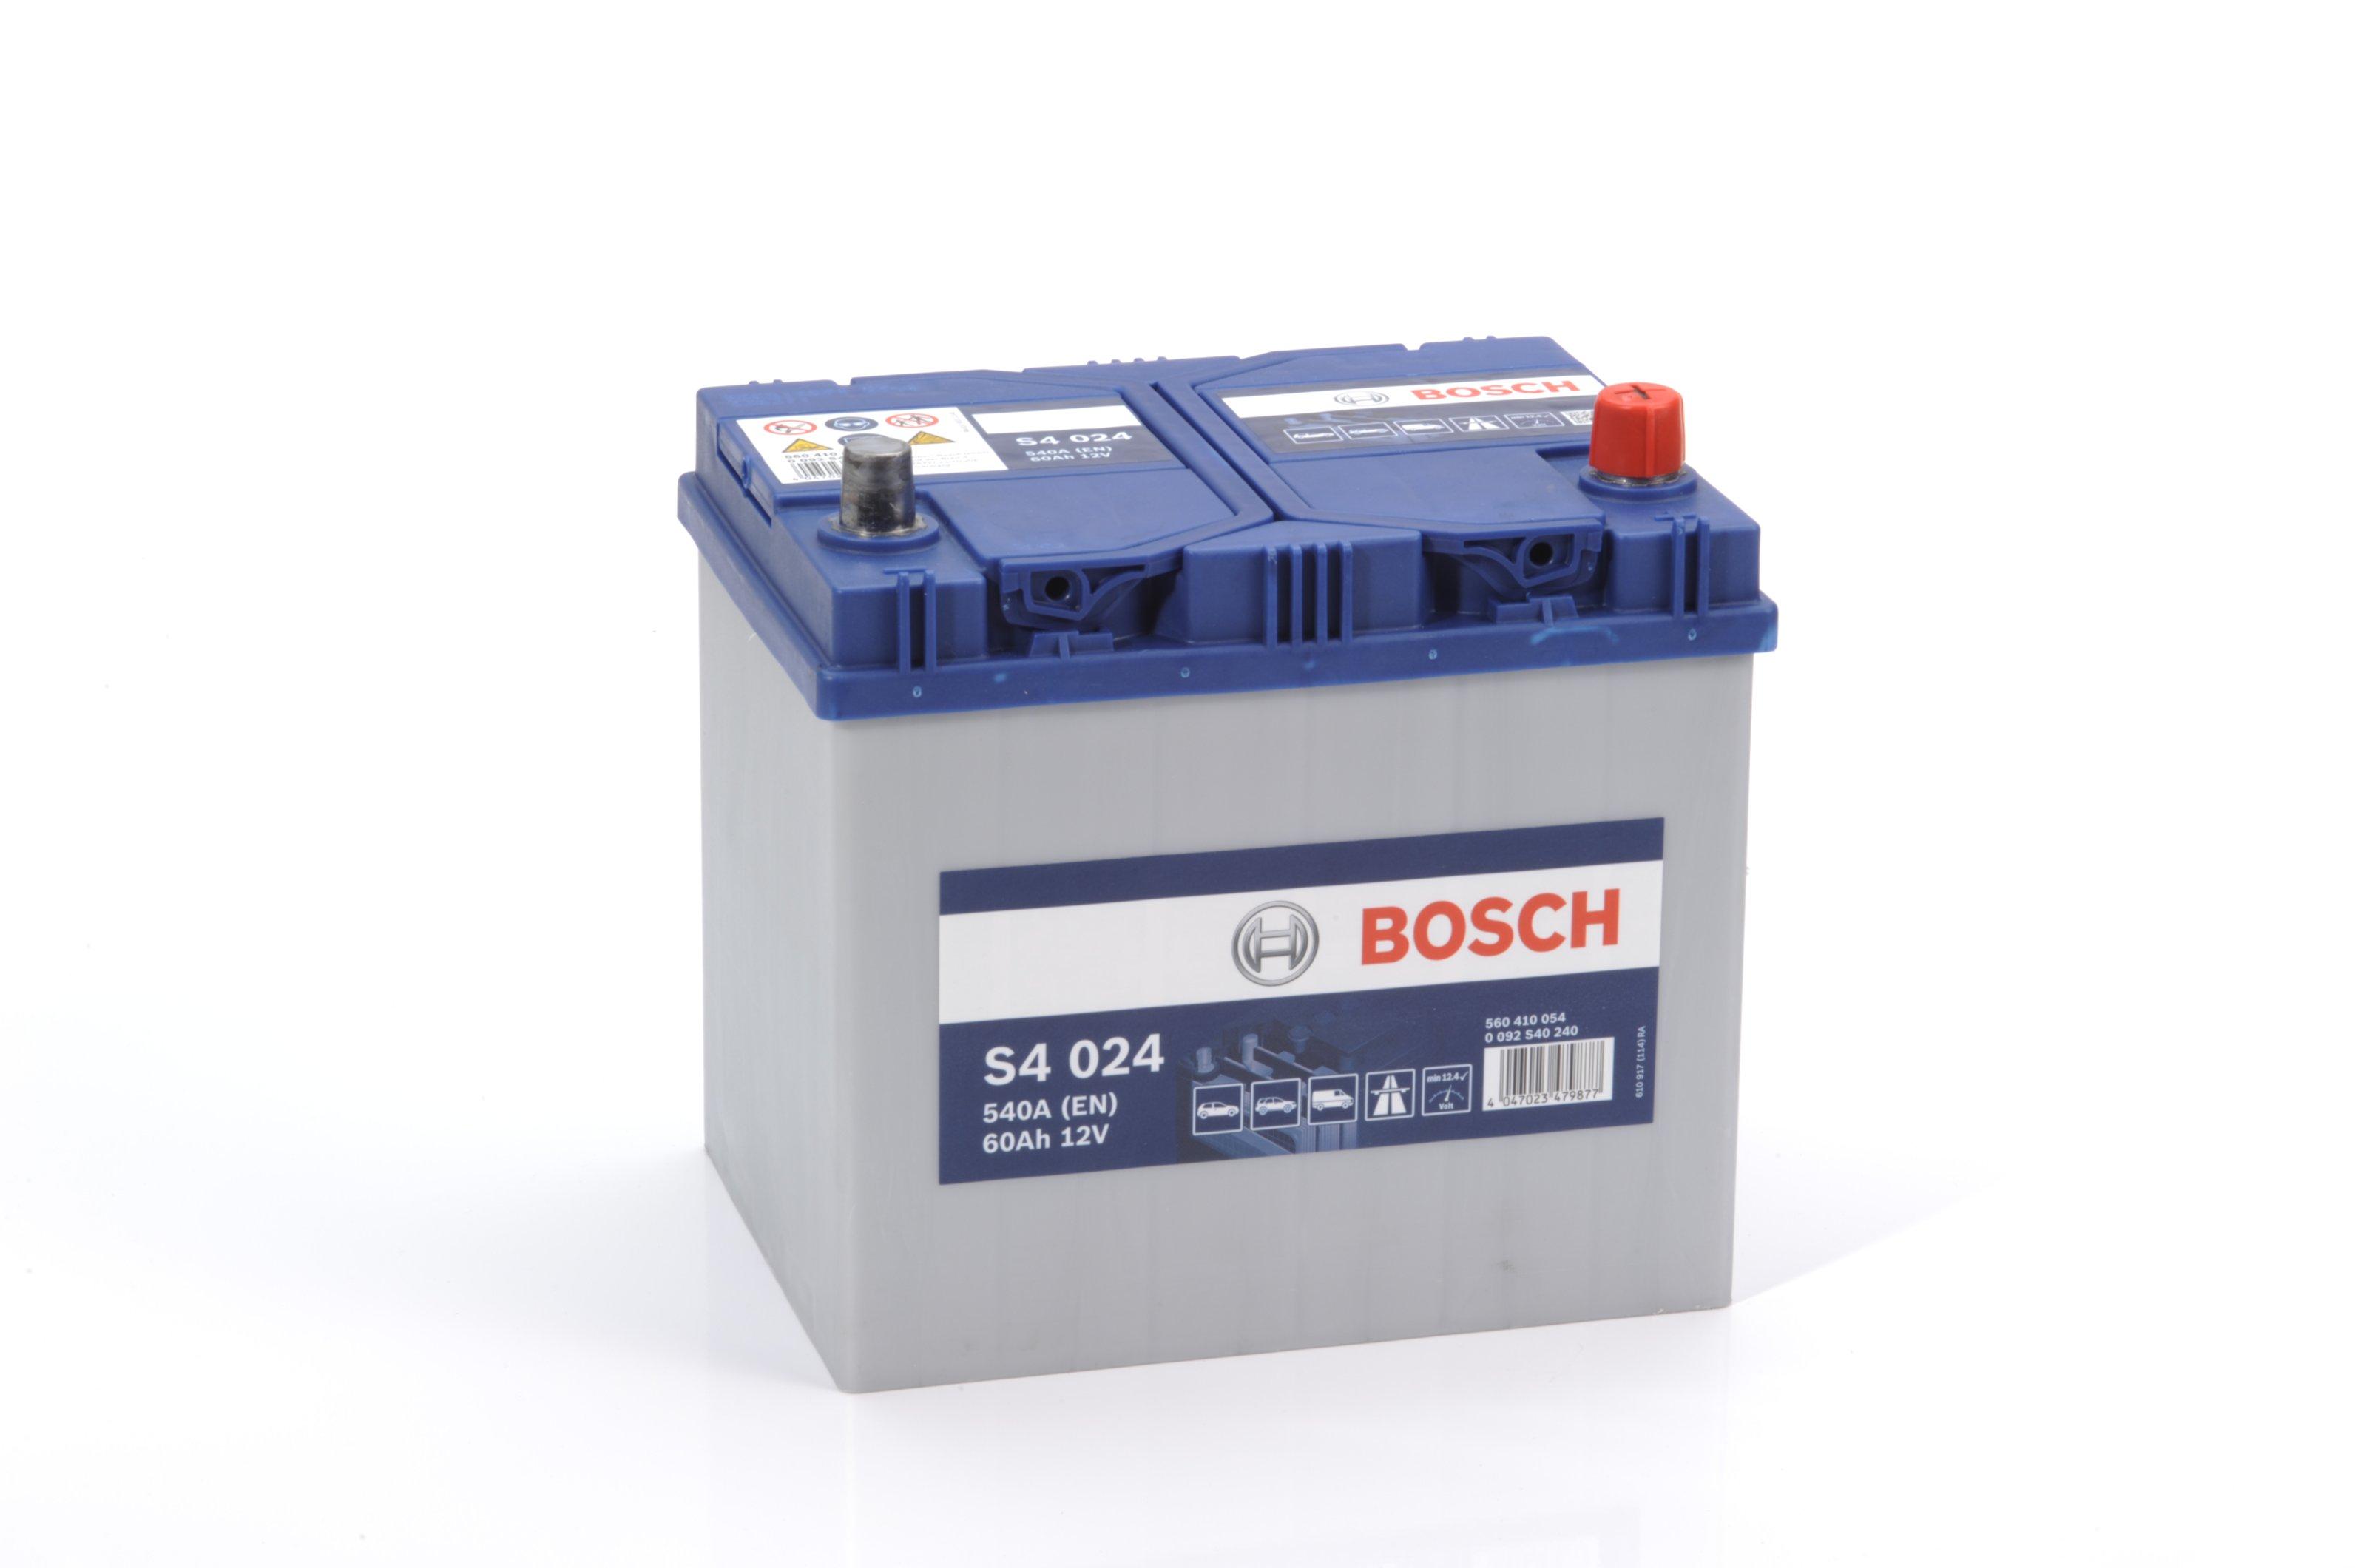 Батарея аккумуляторная Bosch S4 024 12В 60Ач 540A(EN) R+ Bosch 0 092 S40 240 - фото 7